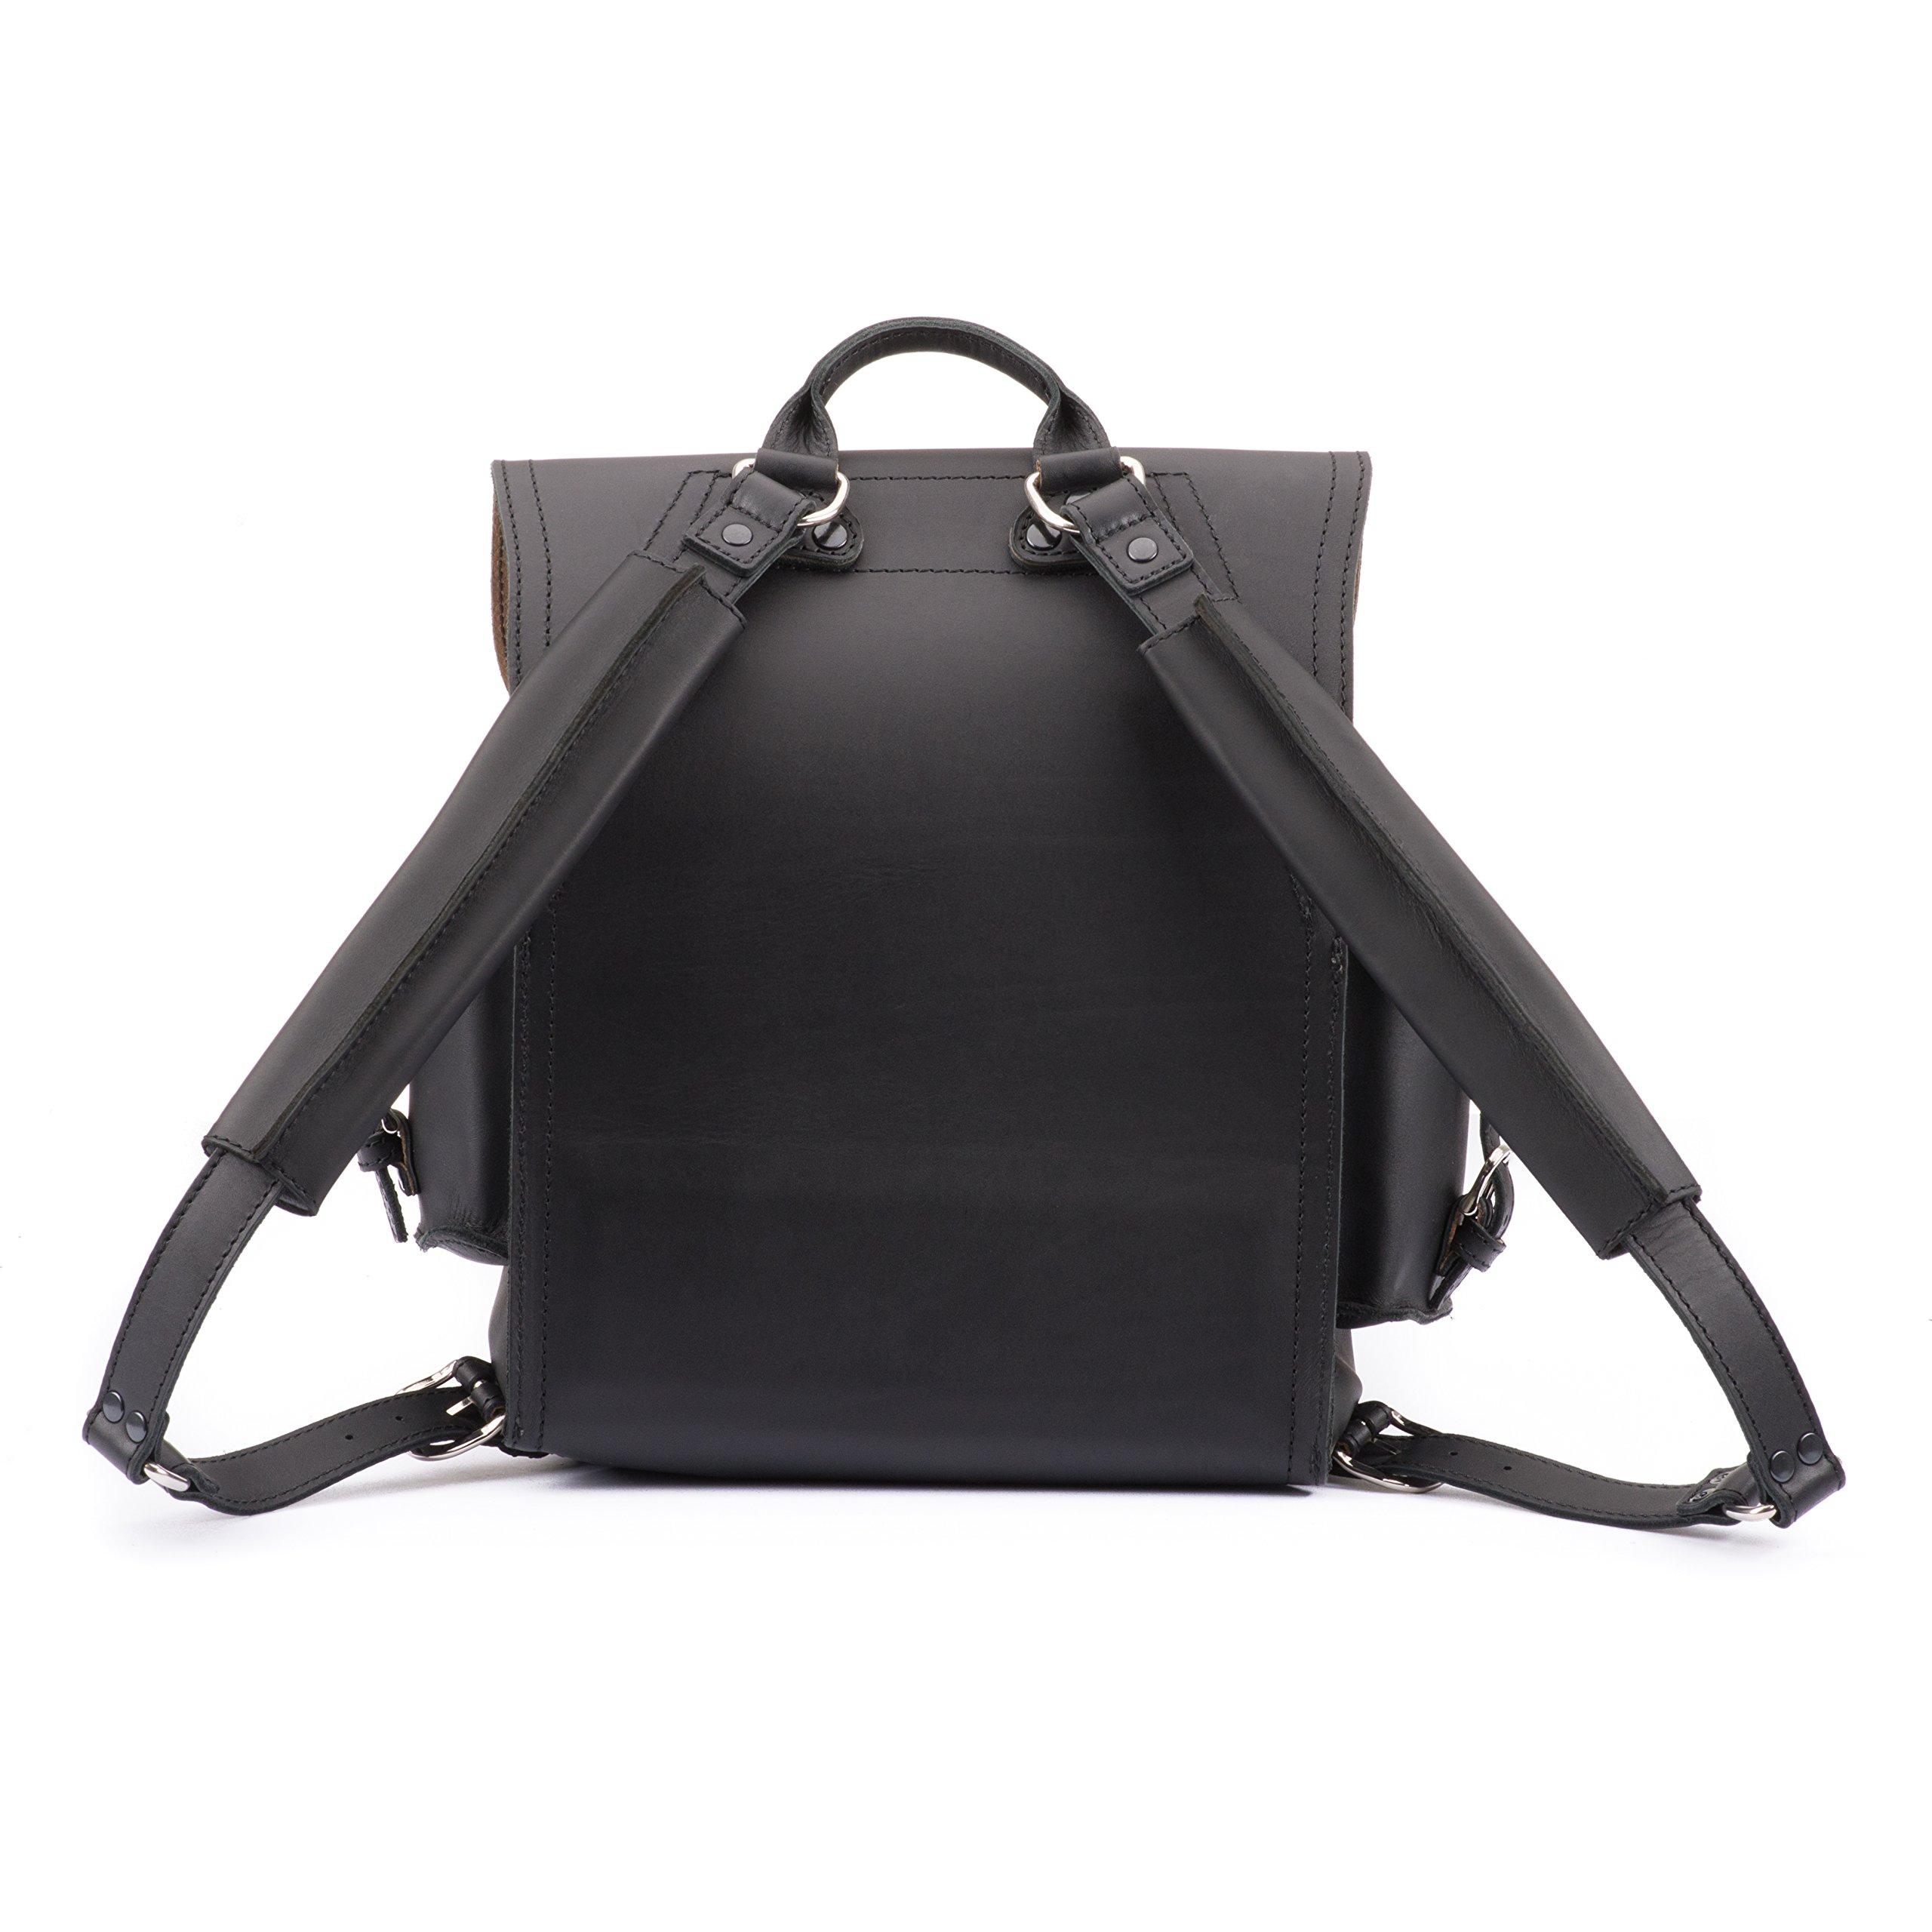 Saddleback Leather Squared Backpack - Best Backpack for School, Business, Travel - 100 Year Warranty by Saddleback Leather Co. (Image #5)